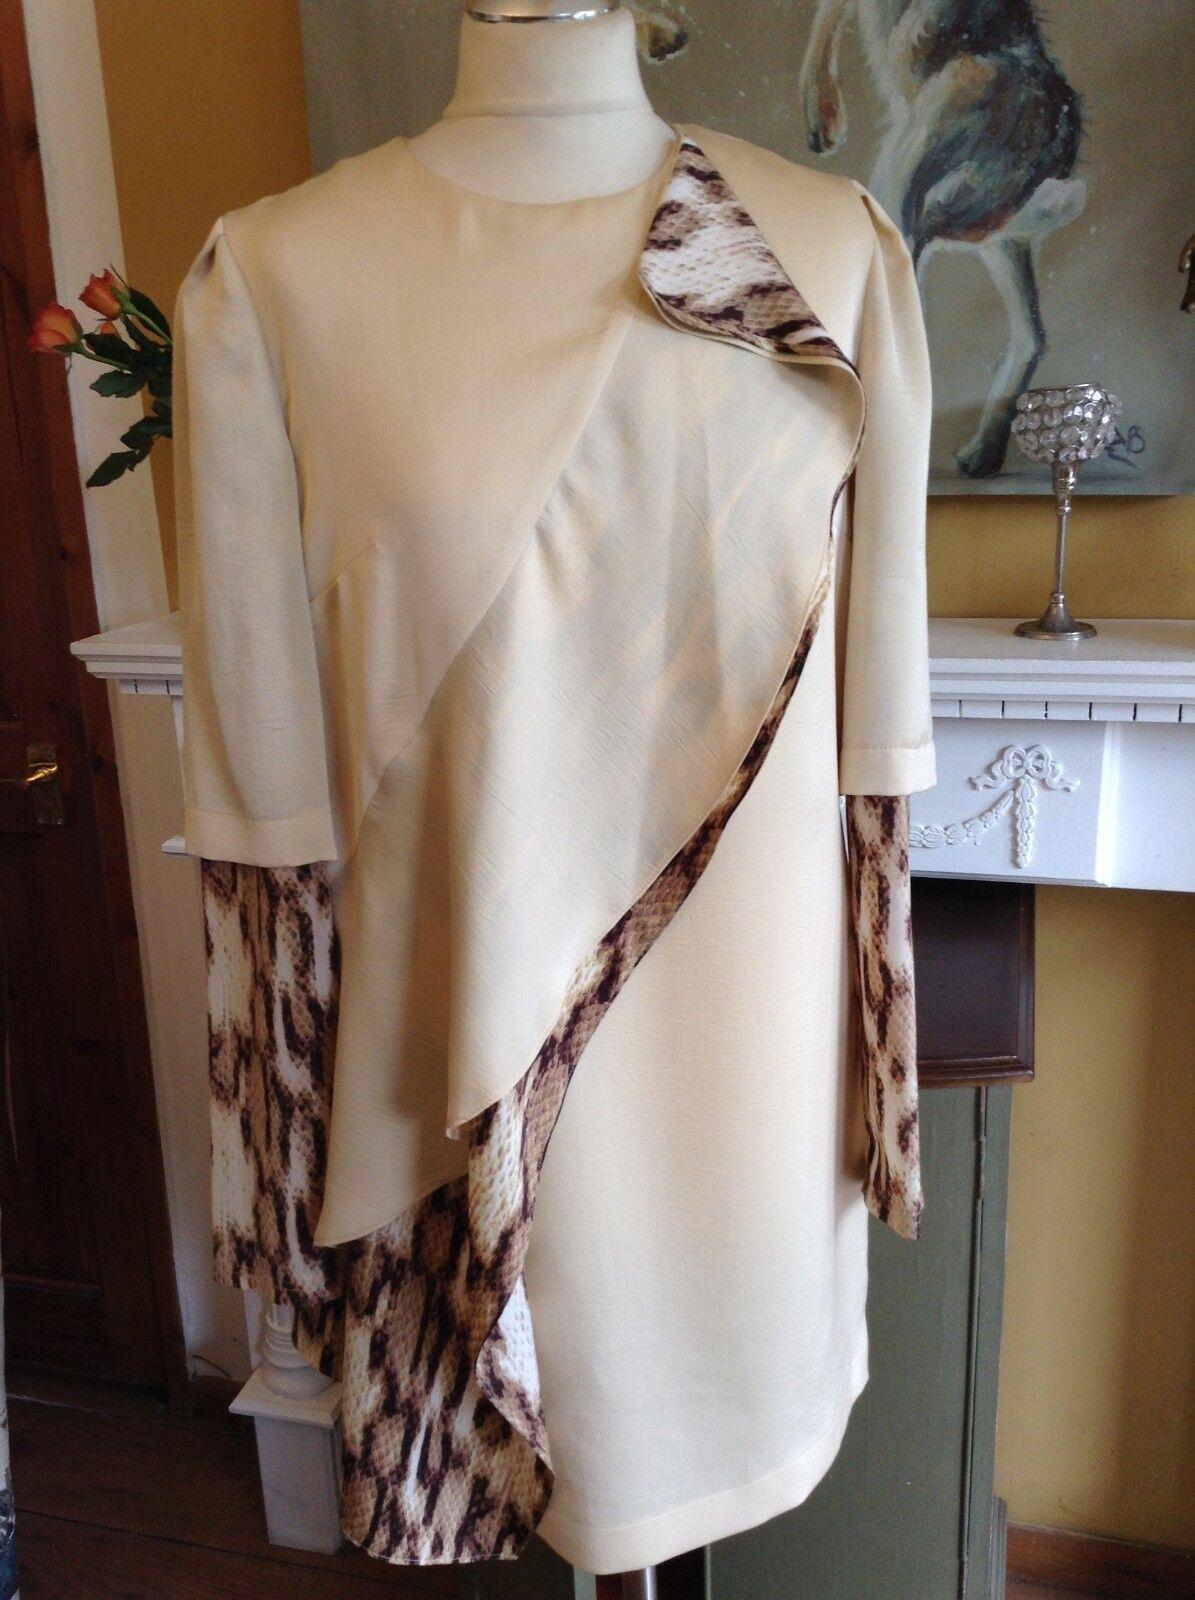 finest selection 0889e e871c BNWT ROBERTO JUST CAVALLI ABITO DRESS LAYERED LEOPARD BNWT CERTILOGO 42 12  UK